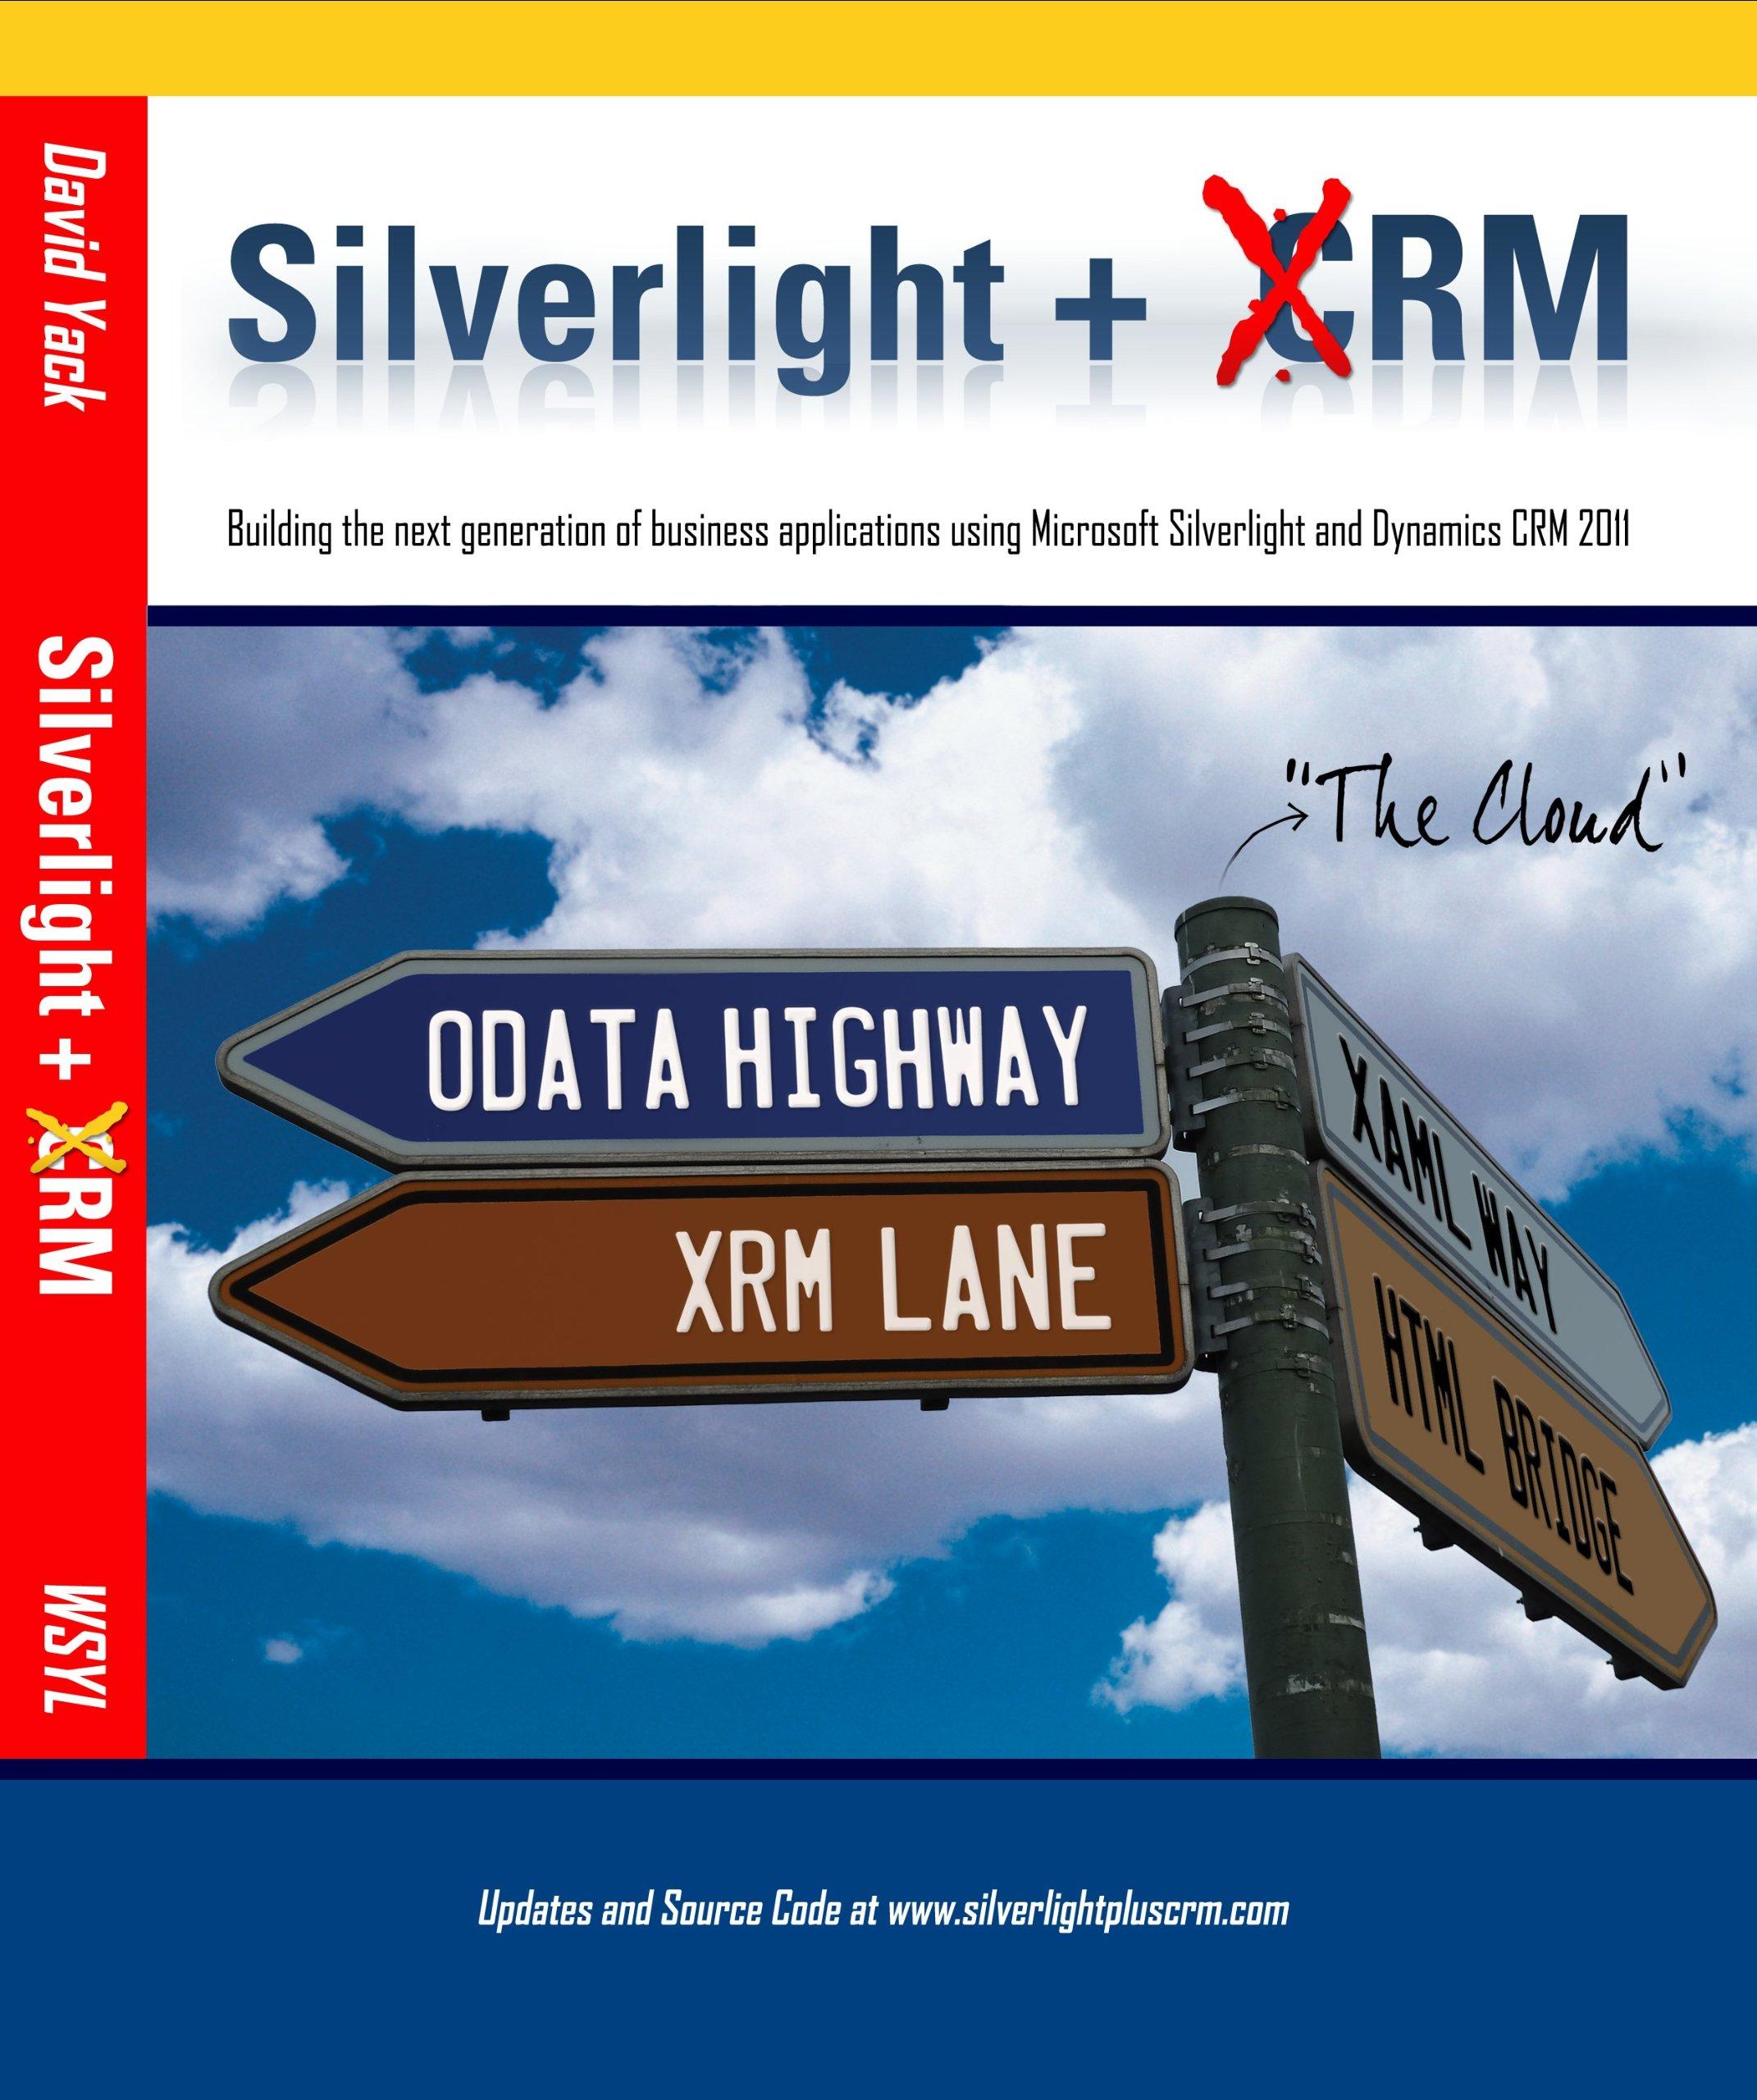 Silverlight + CRM: David Yack, Julie Yack: 9780981511856